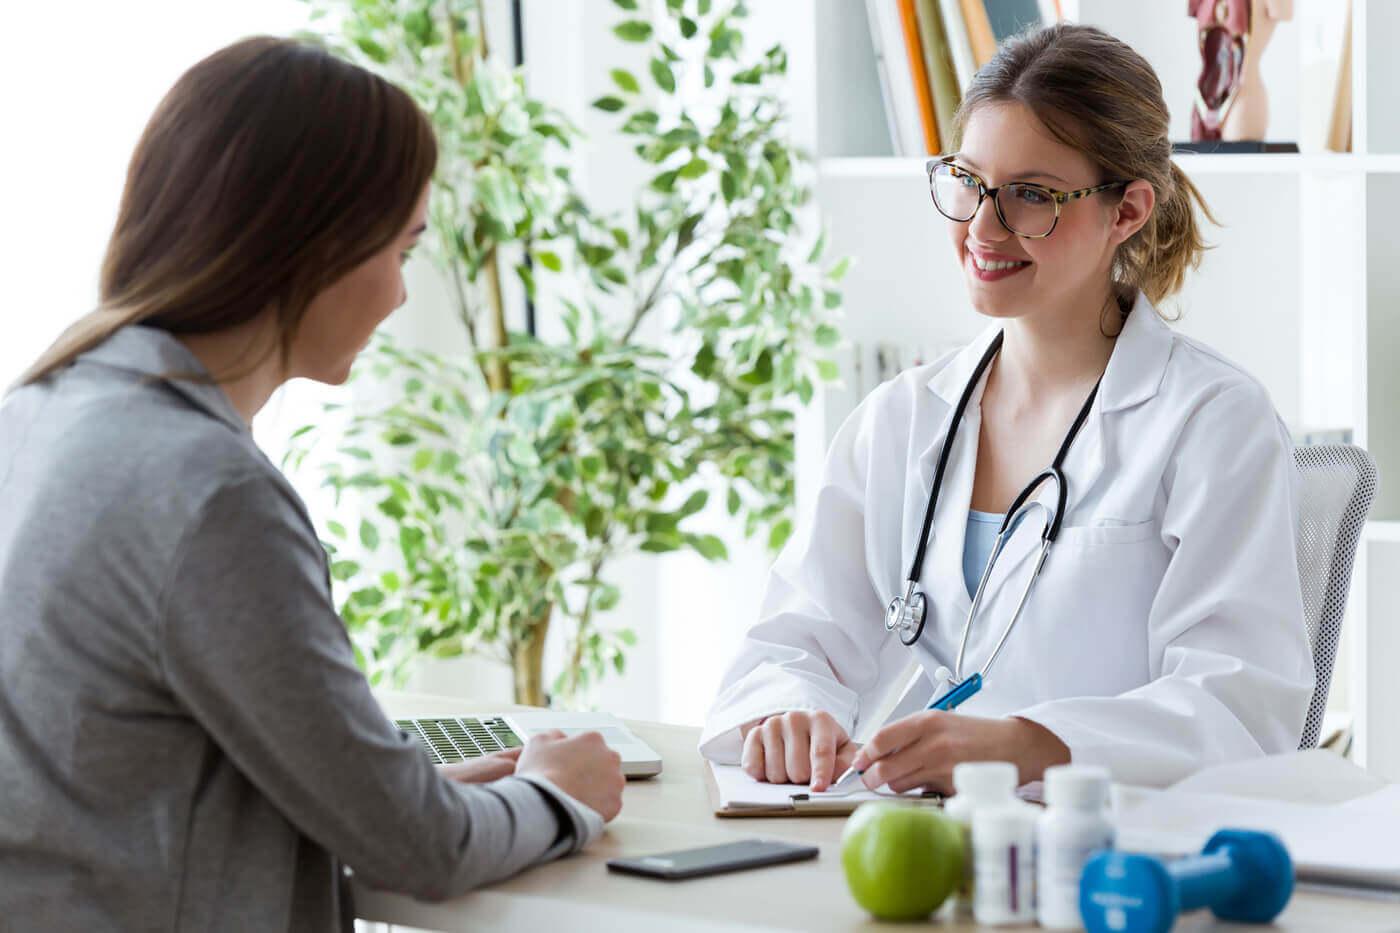 health coaching alongside medical professionals